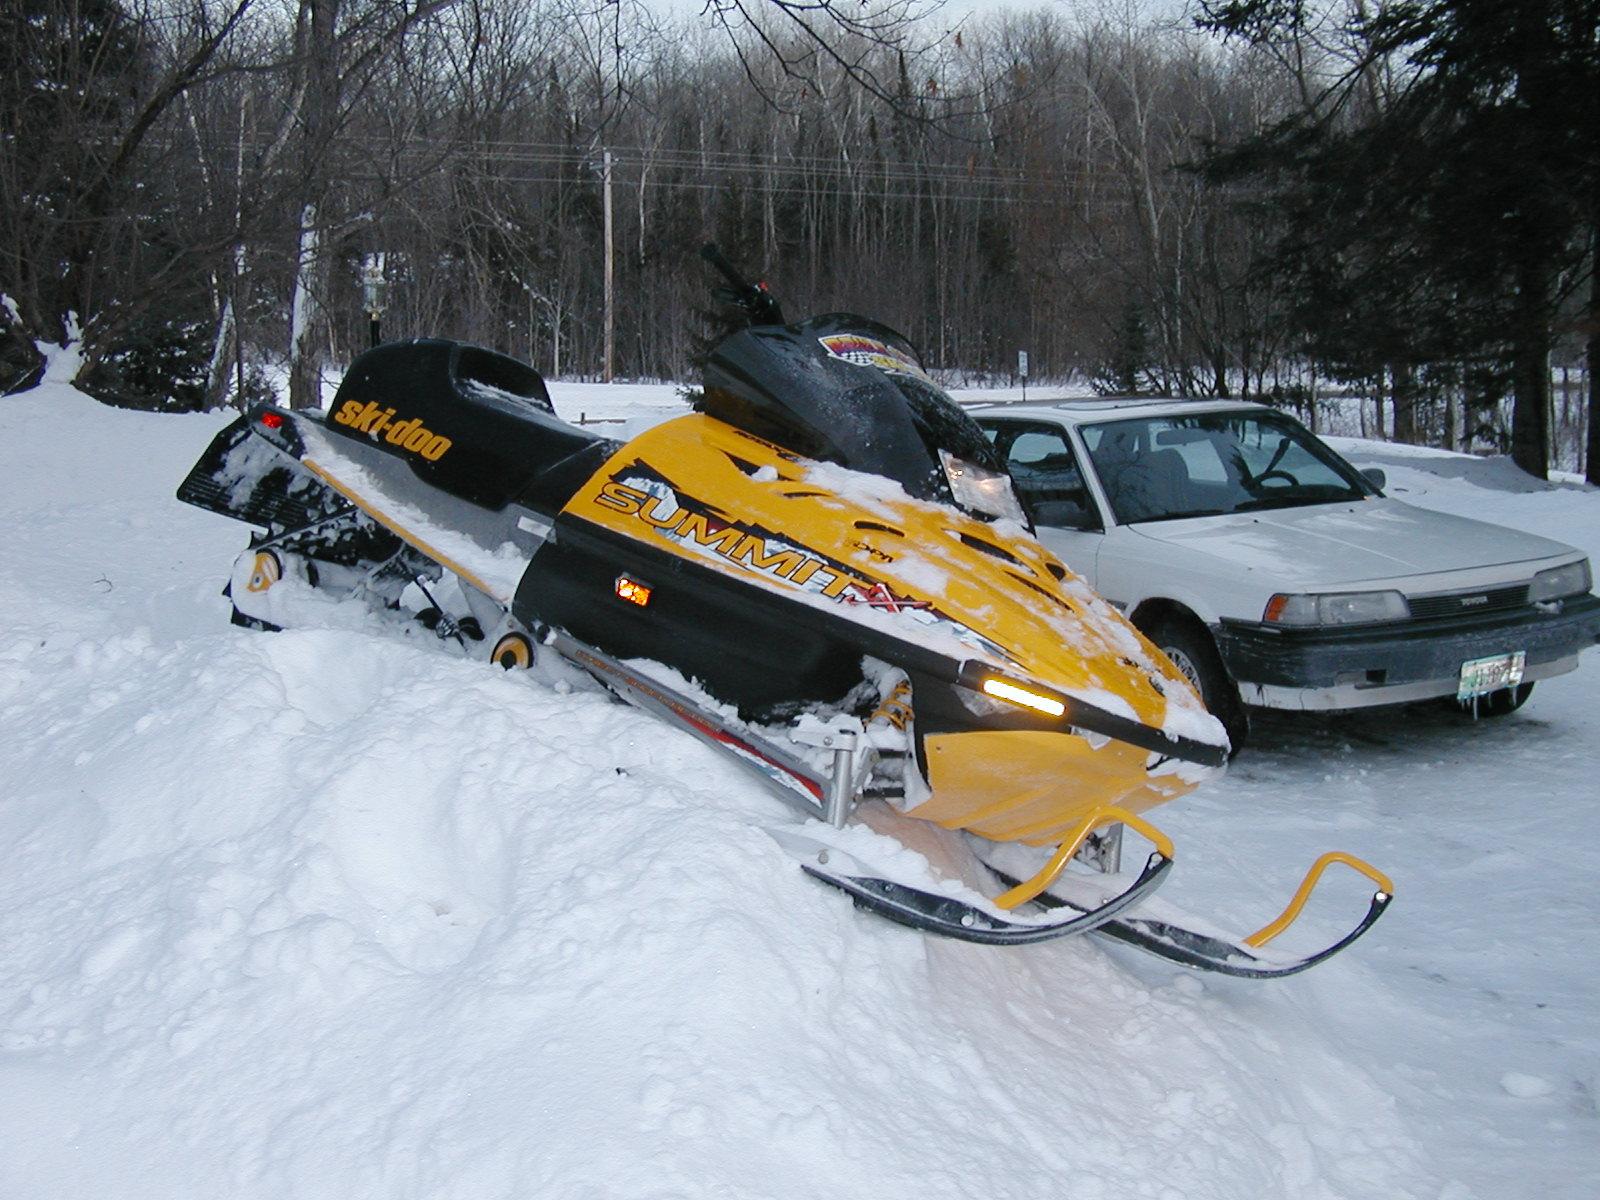 2009 Ski    doo       summit       800    horsepower cadillac